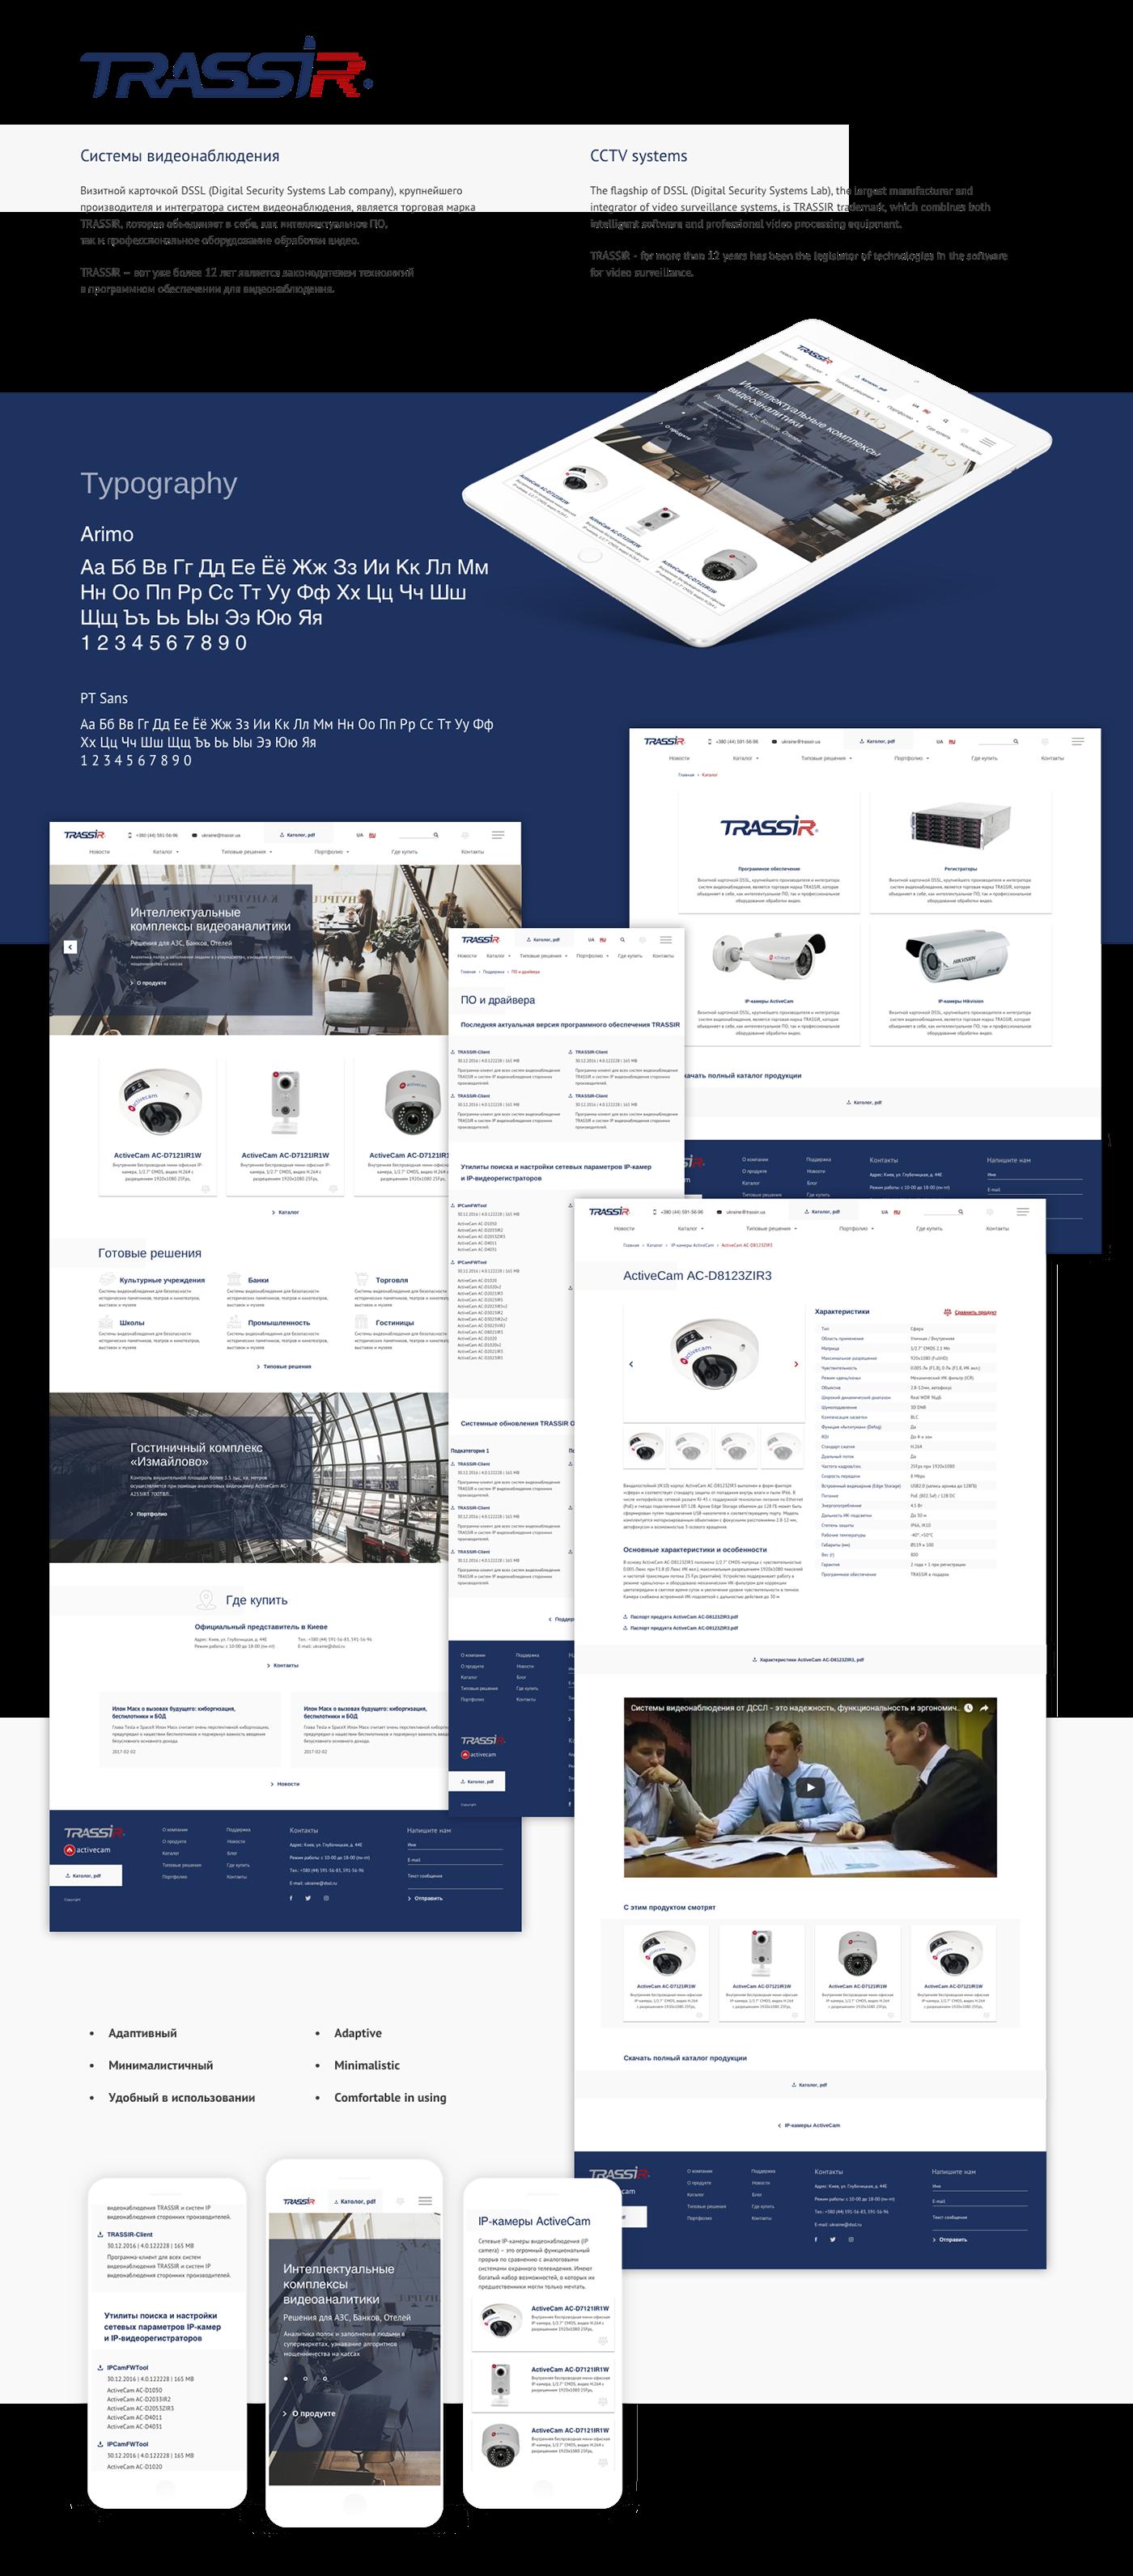 CCTV camera video software Catalogue page